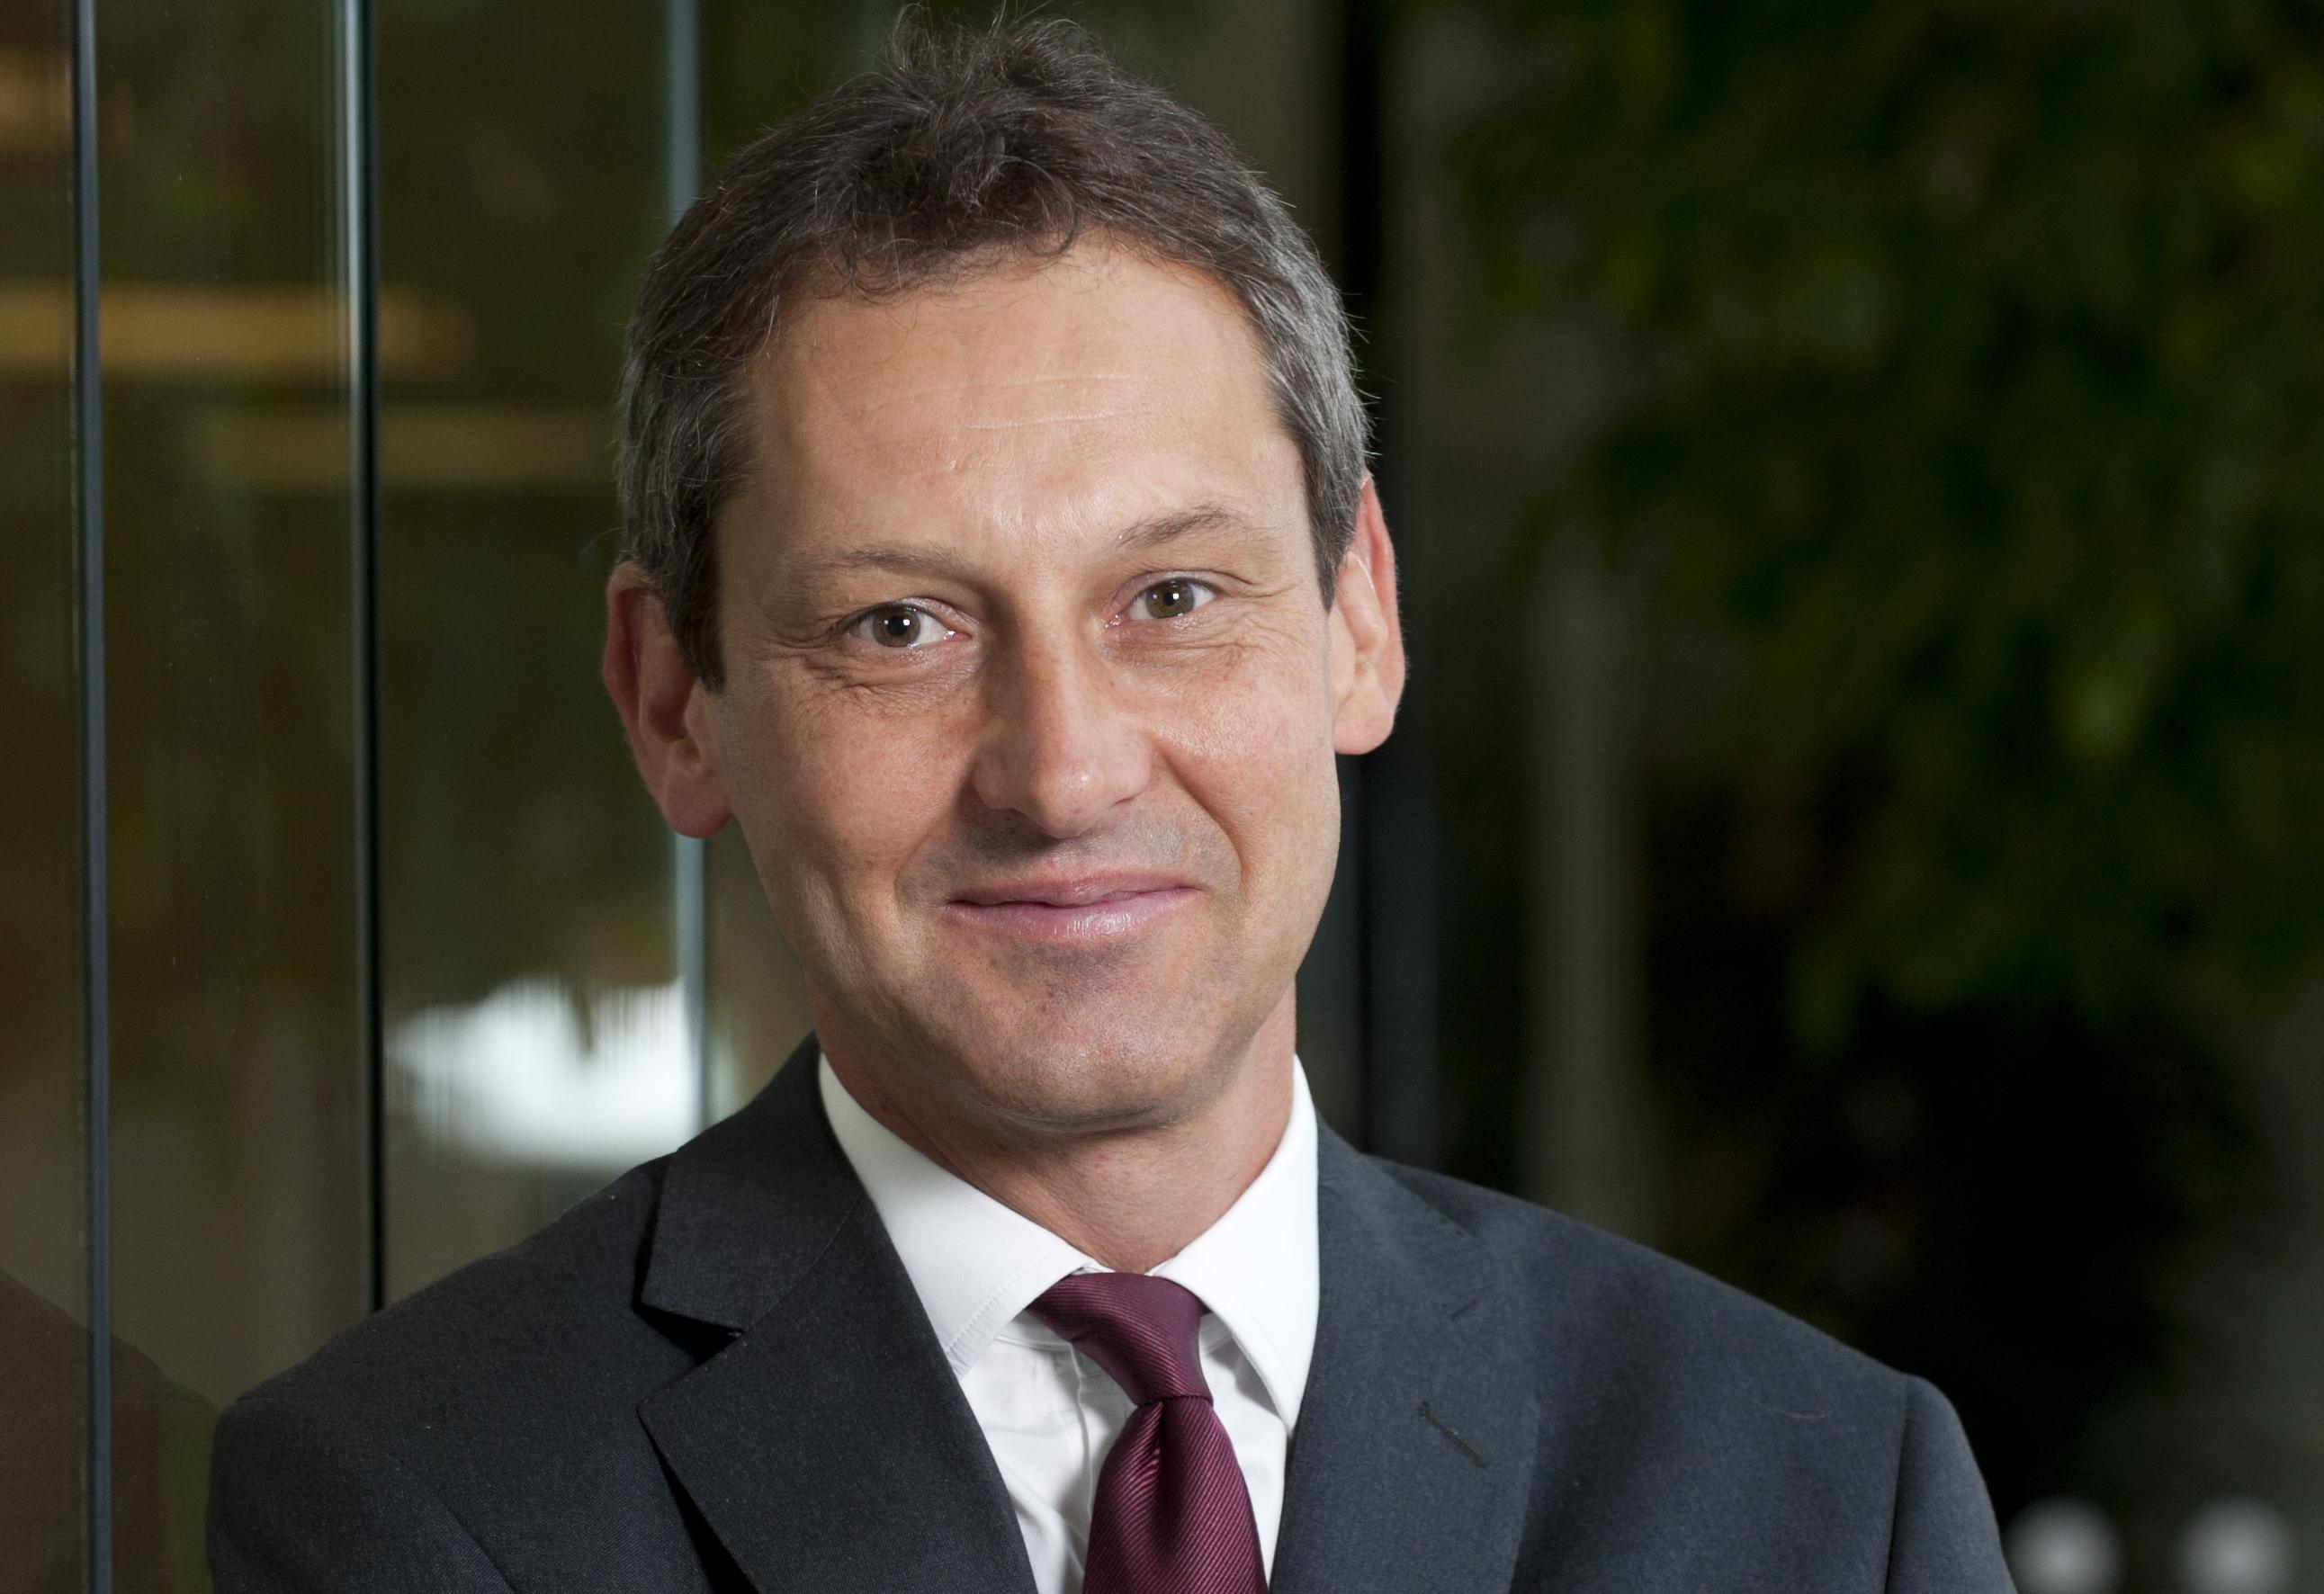 Tom Blacksell, B2B managing director, Experian UK&I